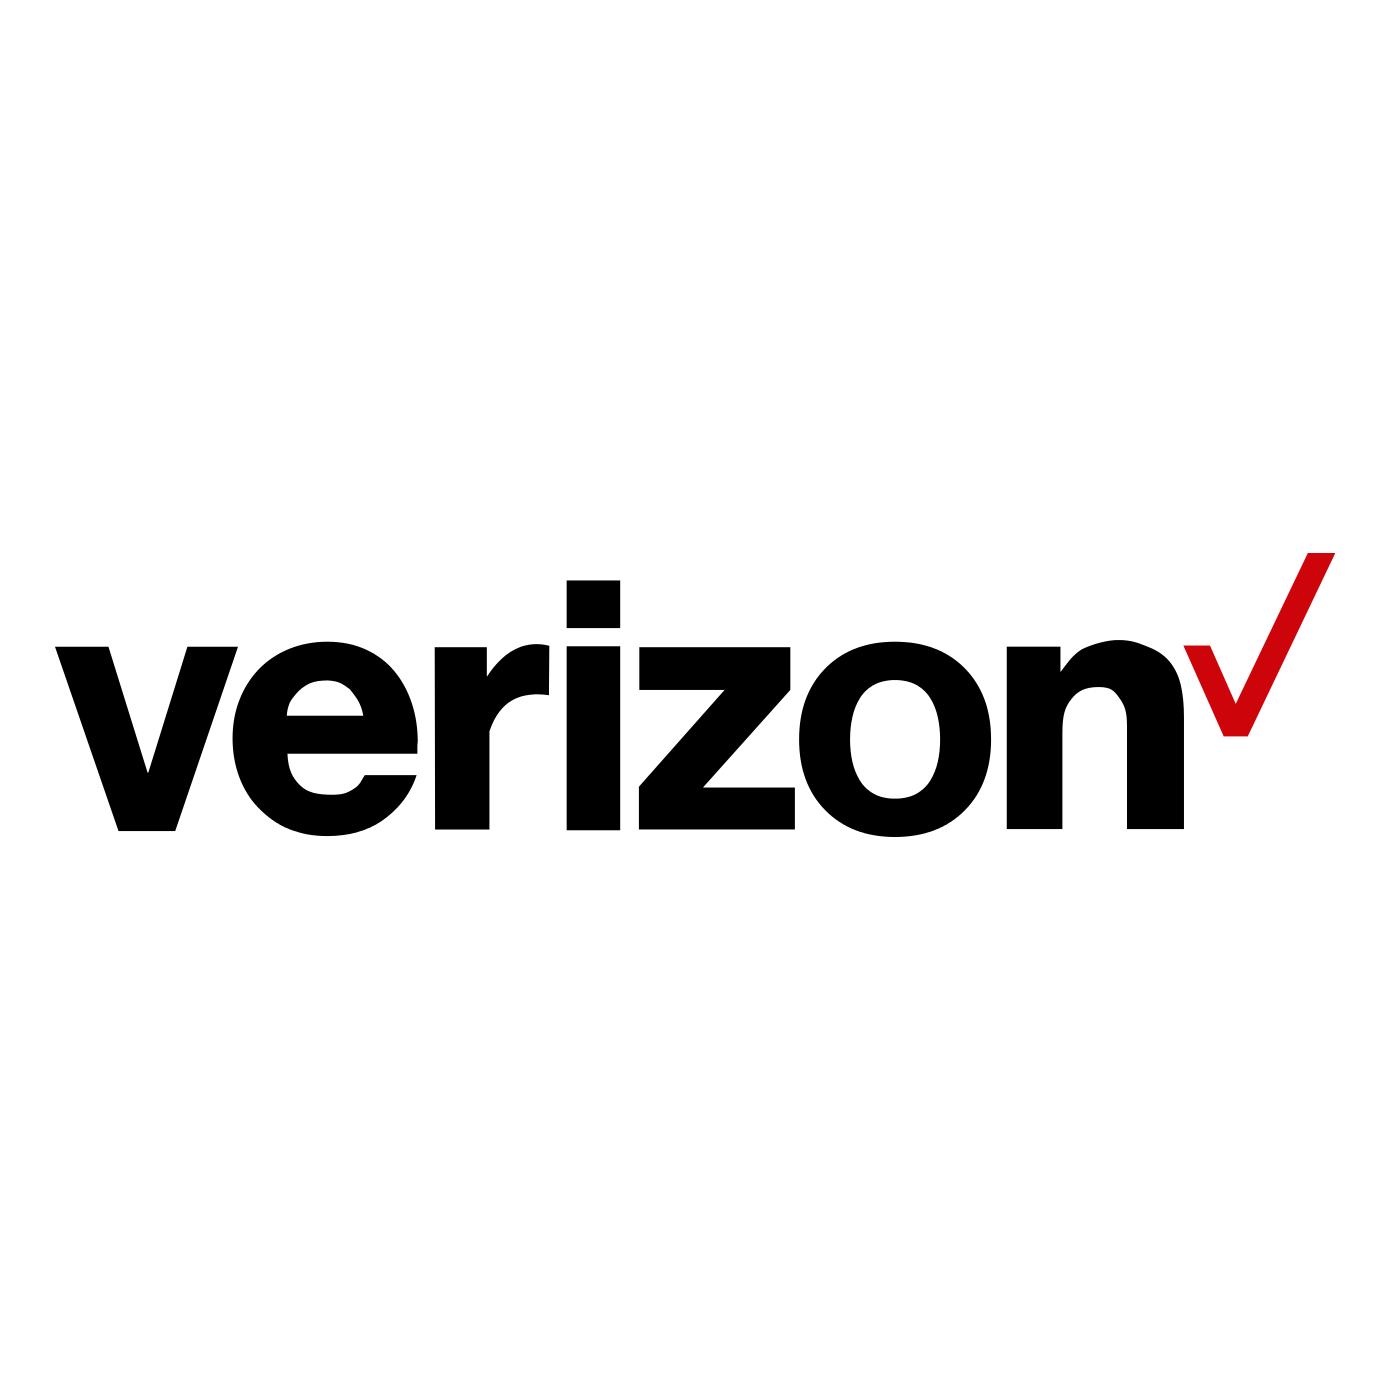 Verizon 1.png